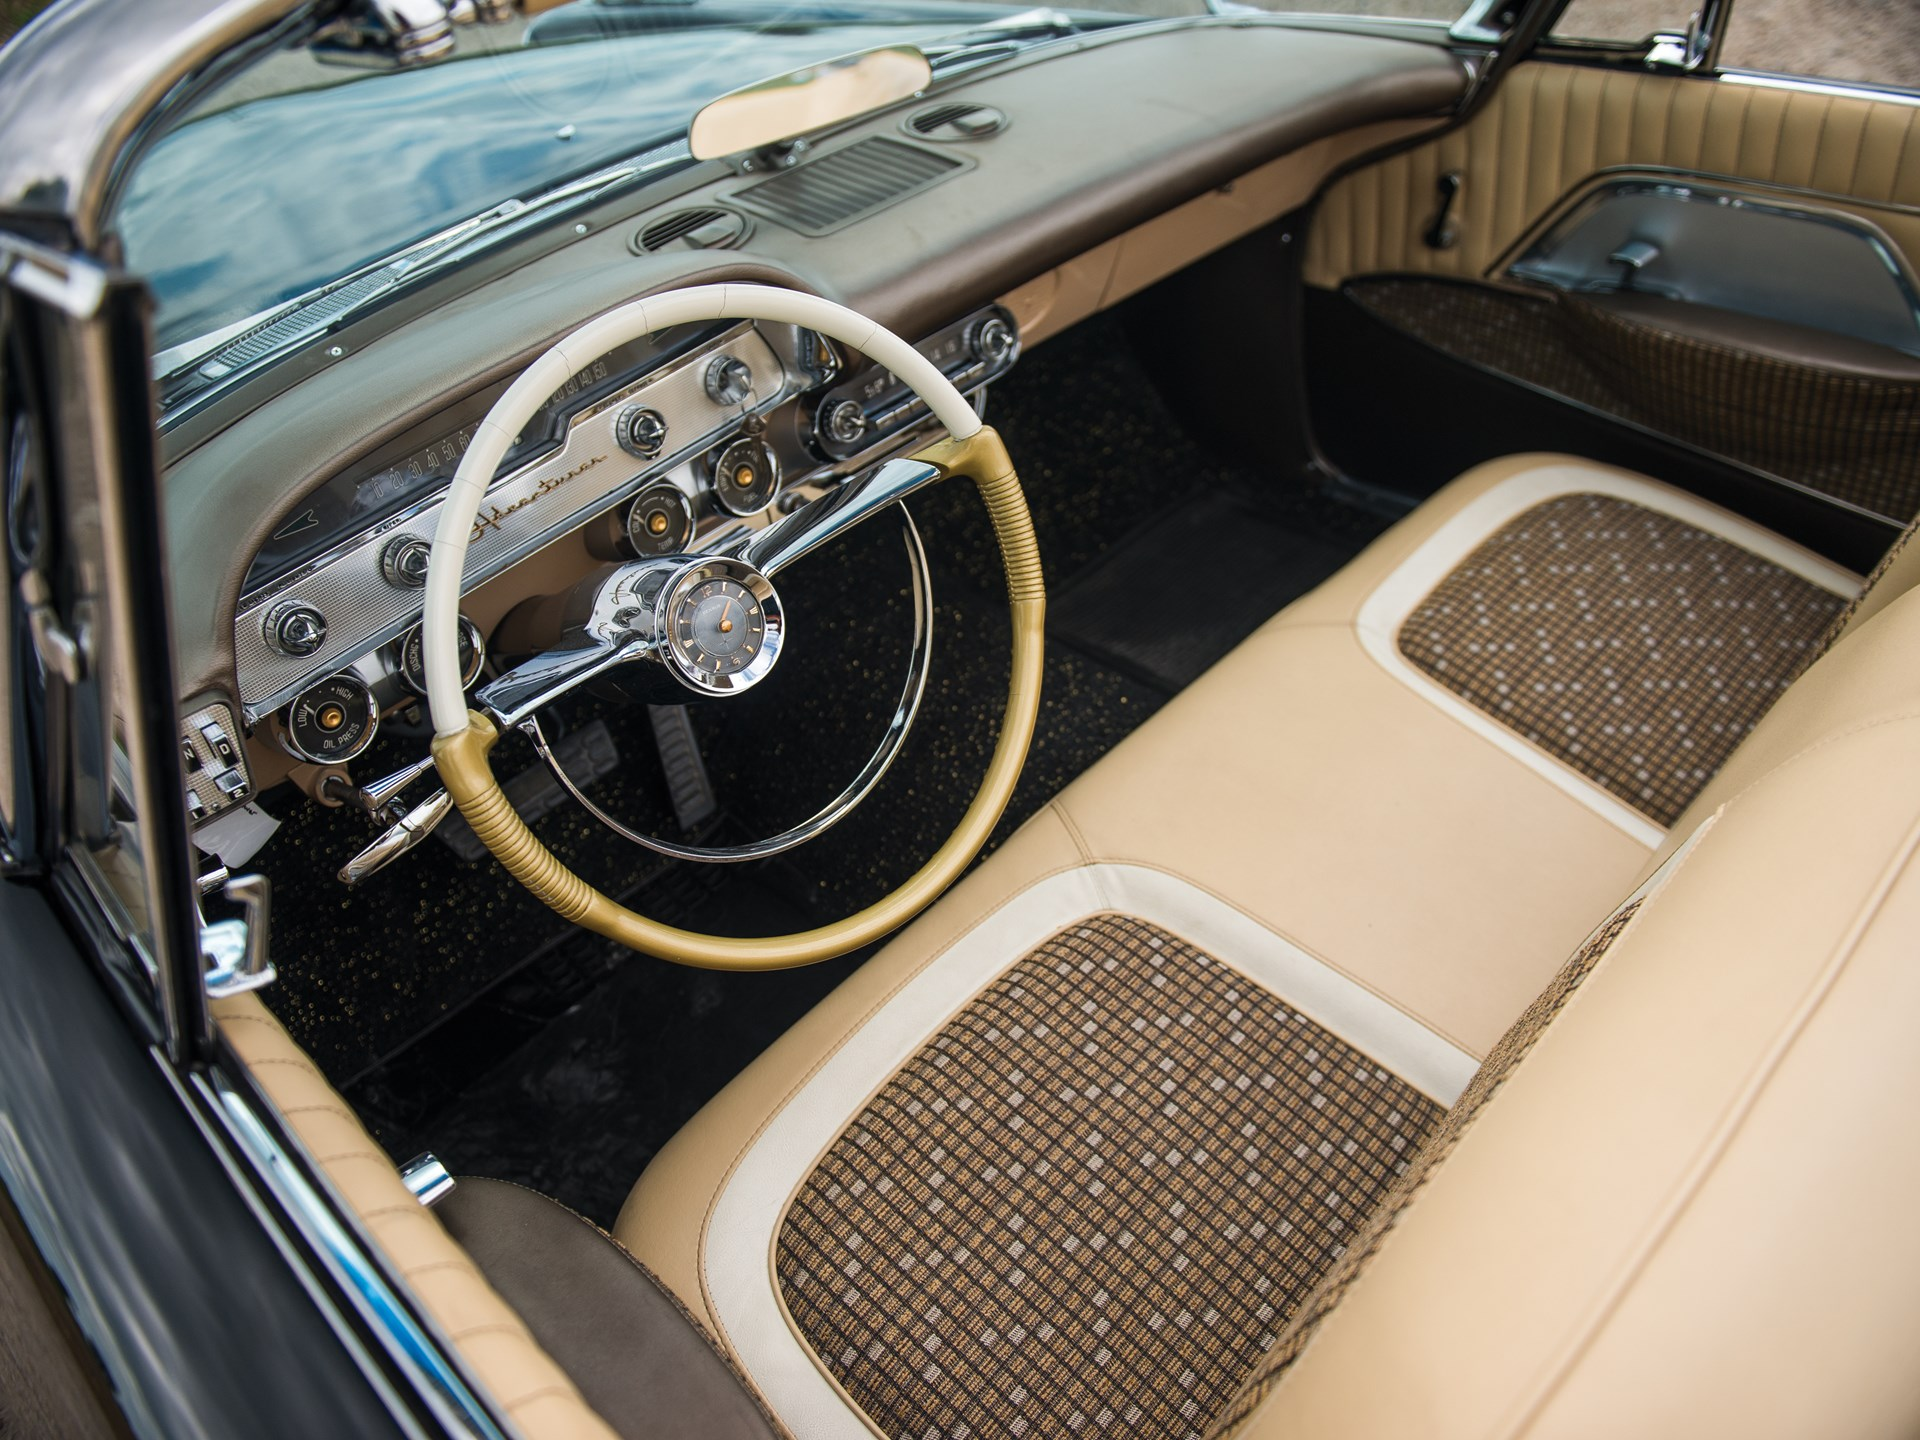 1957 DeSoto Adventurer Convertible interior